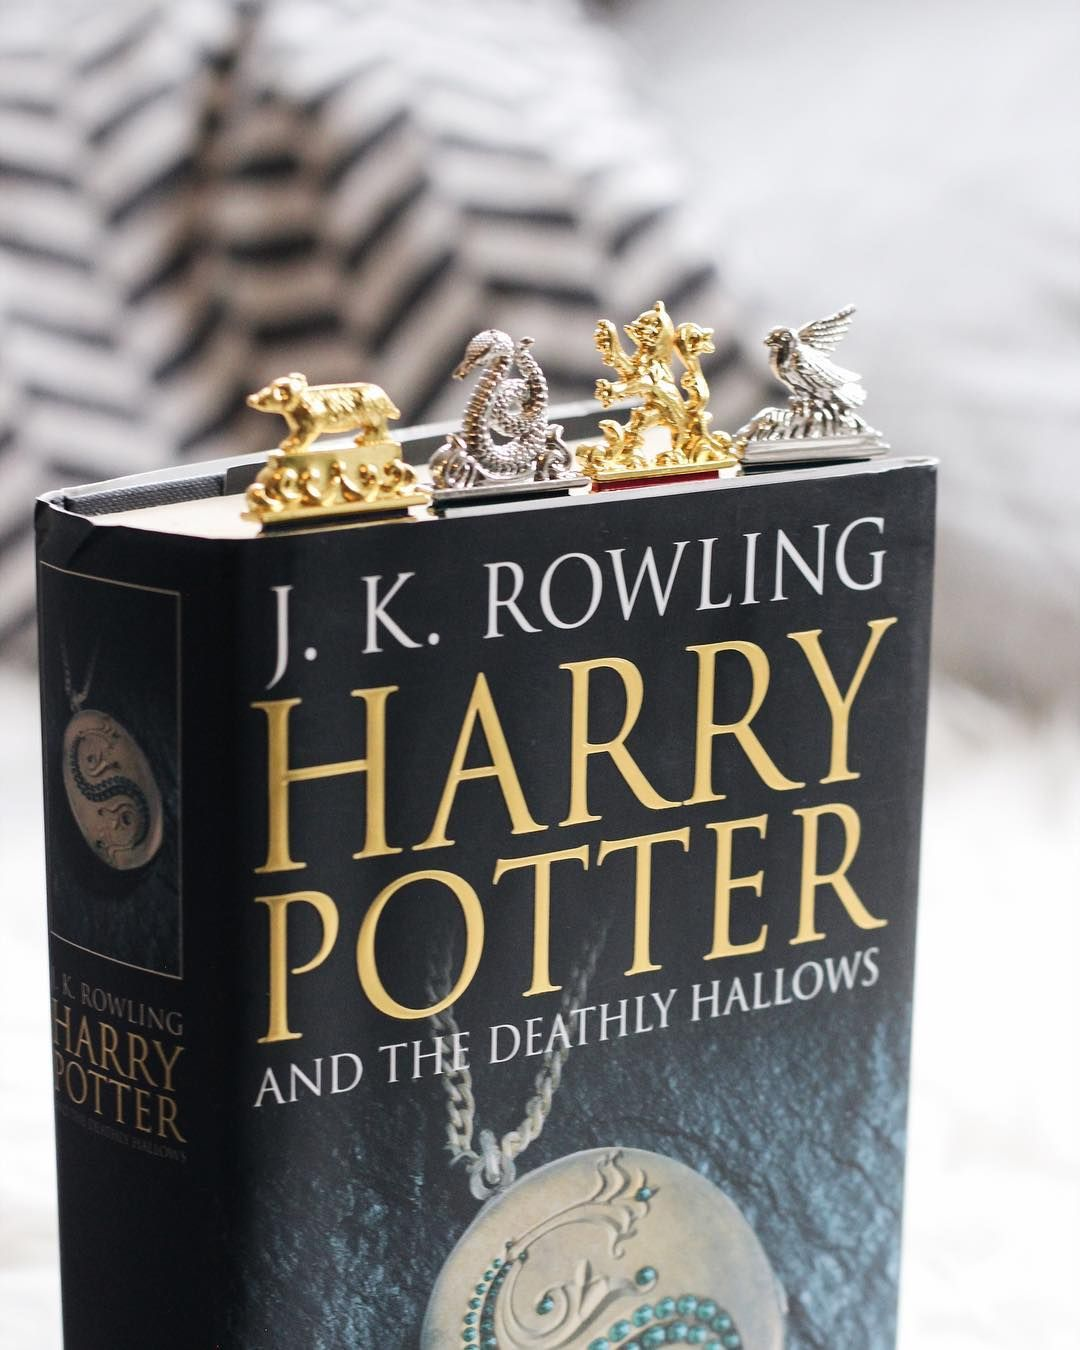 Housepride Potterhead Harrypotter Bookmarks Hogwartshouses Harrypotterbooks Harry Potter Hallows Rowling Harry Potter Harry Potter Aesthetic